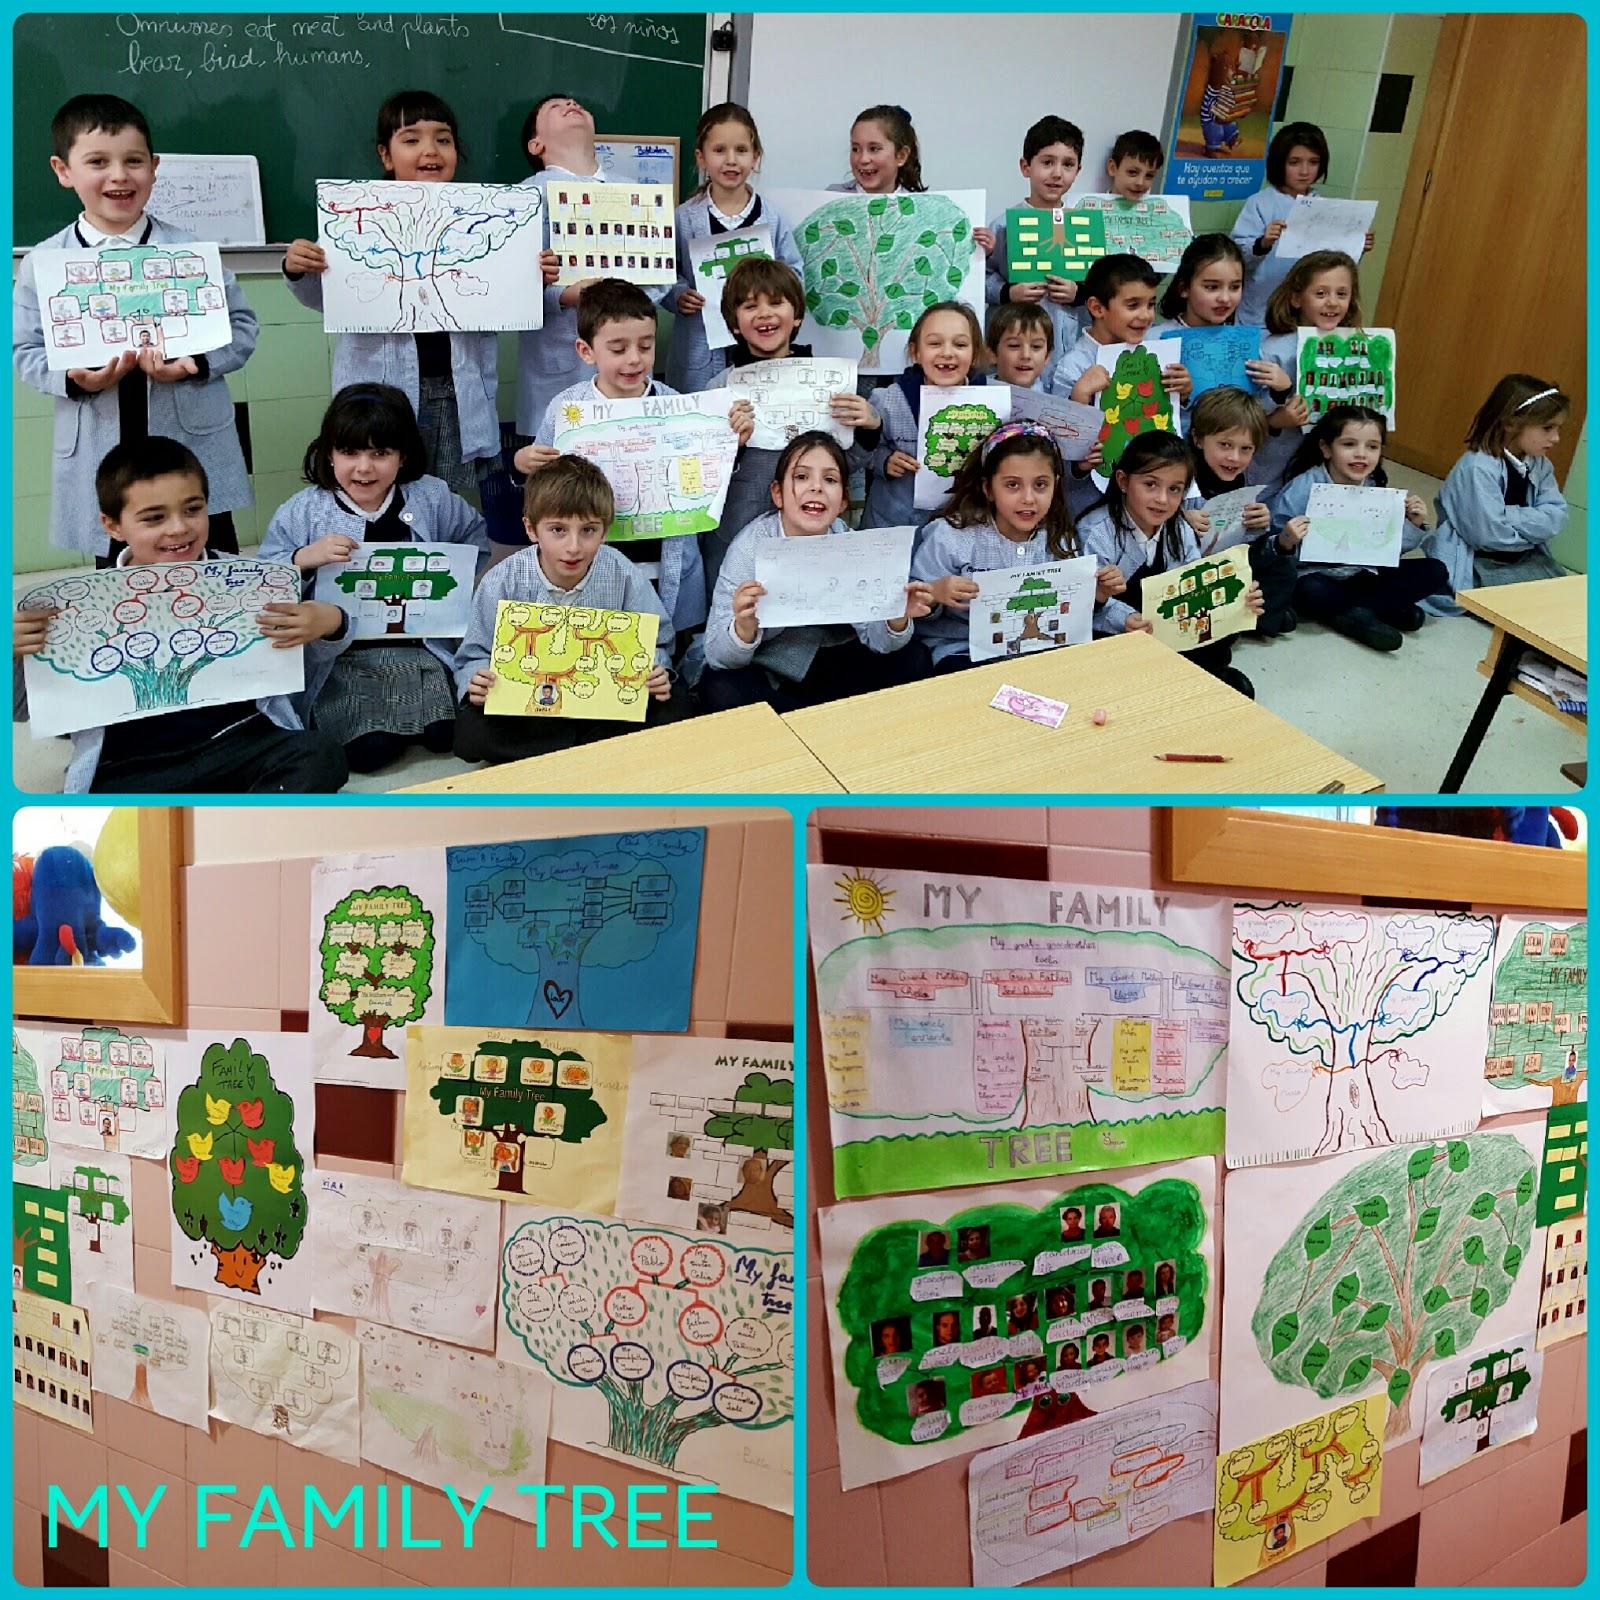 Agustinas Valladolid - 2017 - Primaria 1 - My Family Tree 1